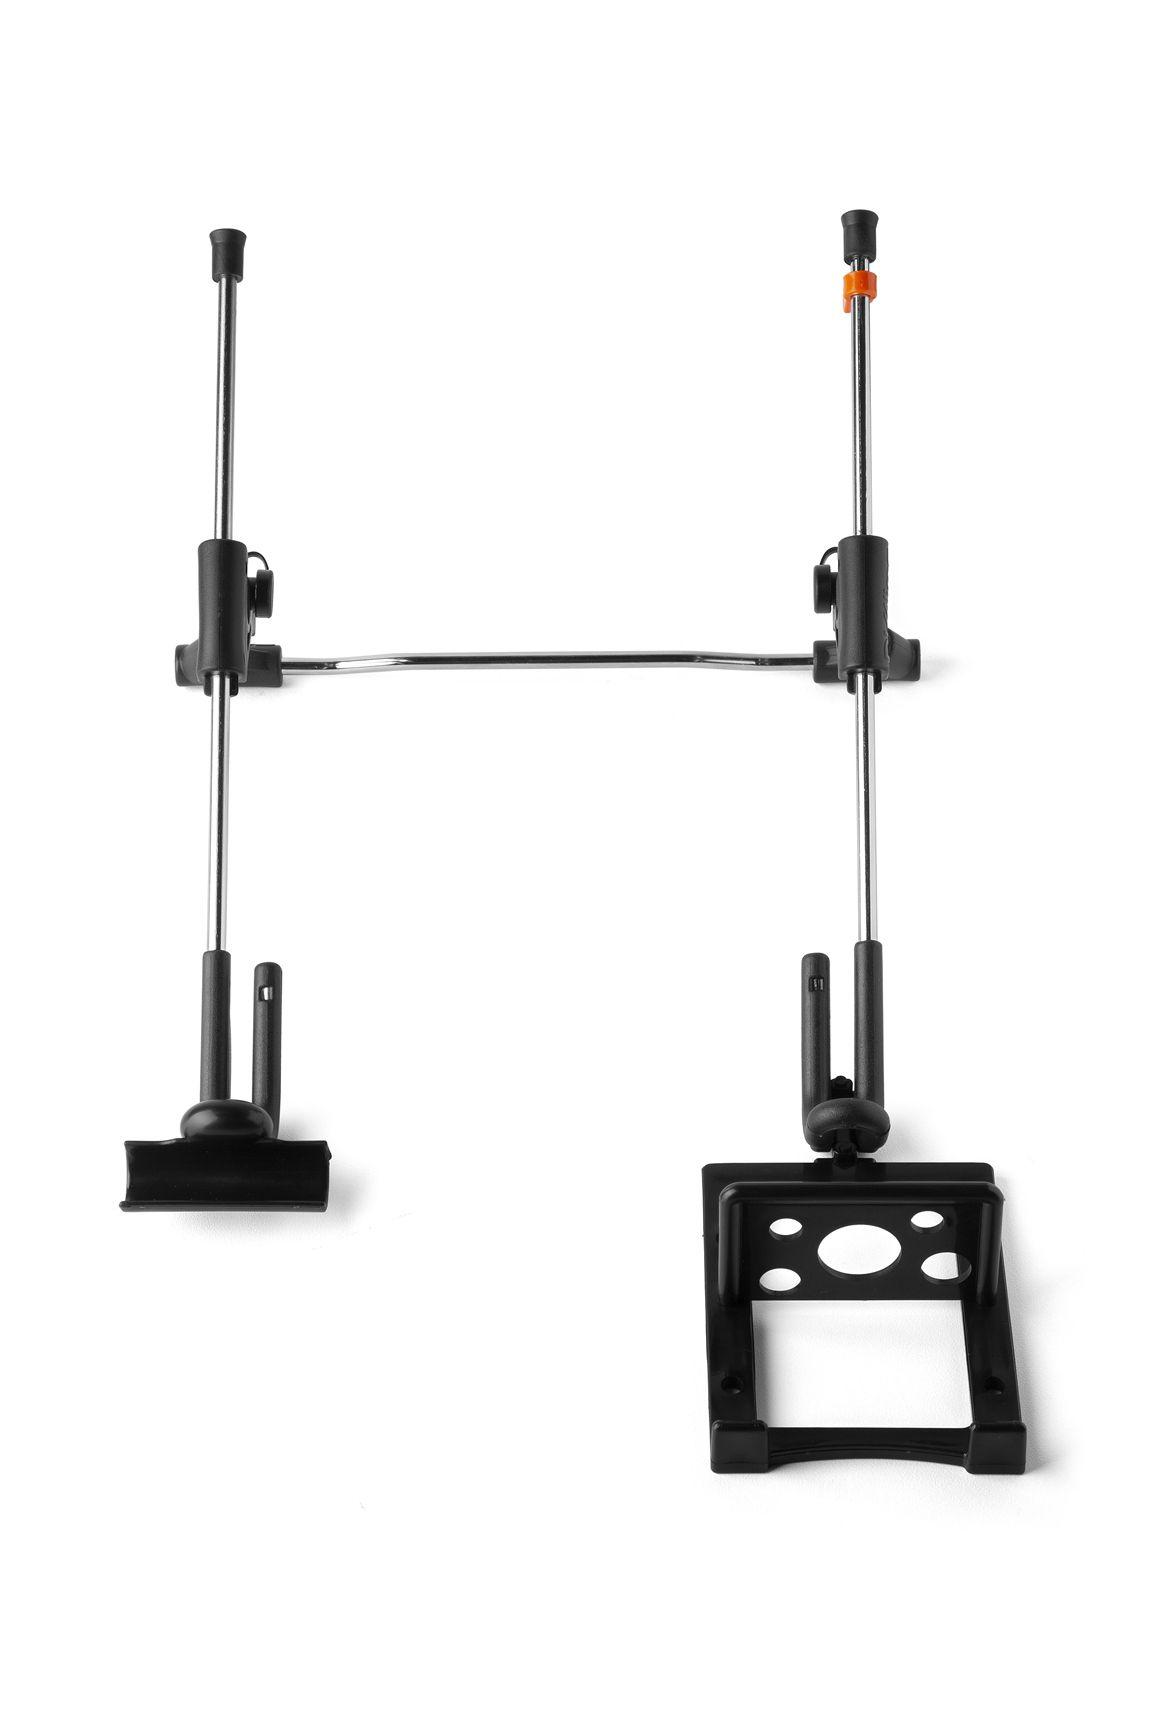 Kit 3 Suporte Universal Para Notebook Netbook Tablet Ergonômico